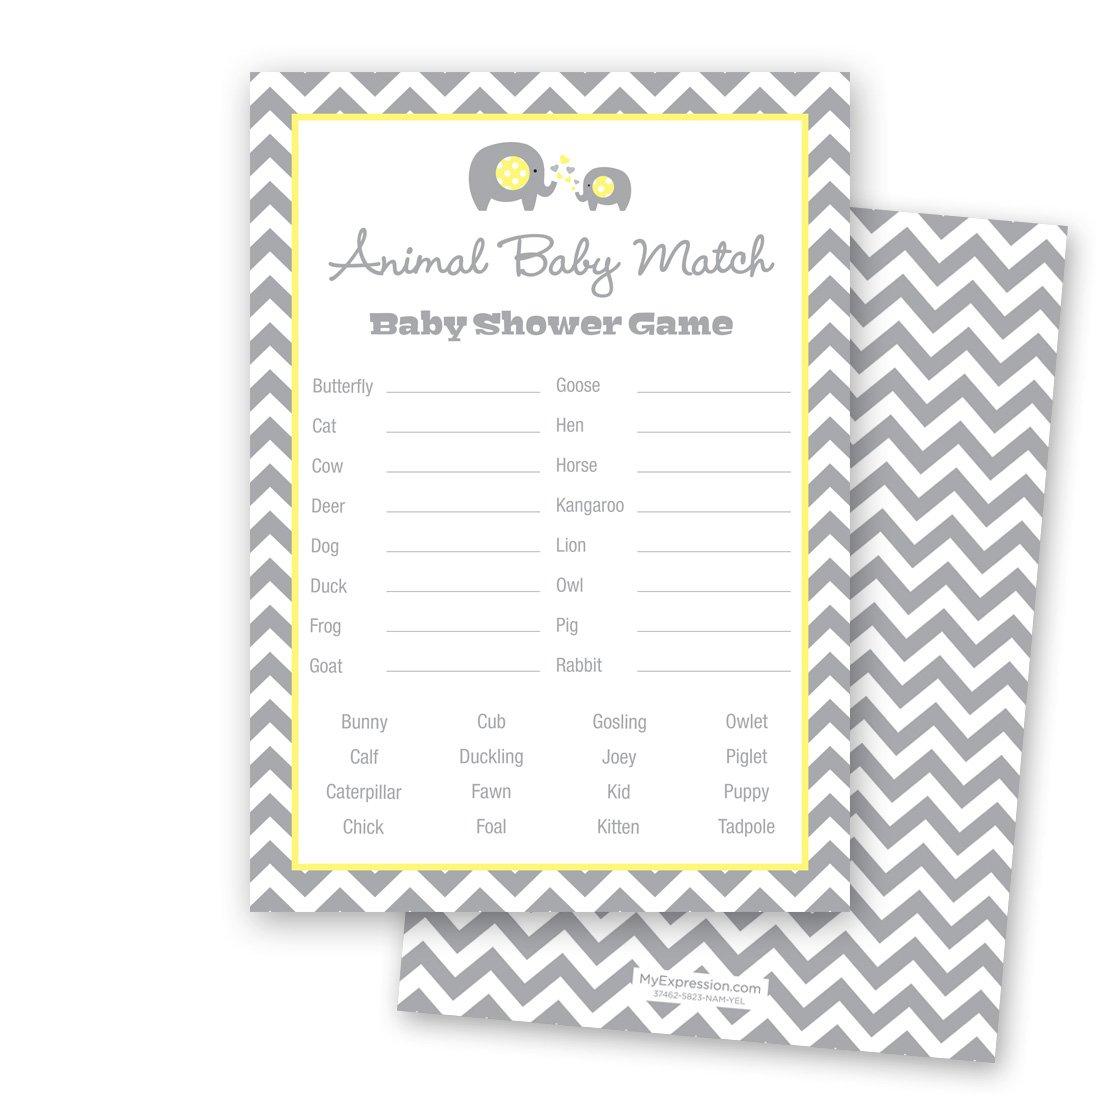 24 Chevron Elephant Baby Shower Animal Name Game Cards (Yellow)